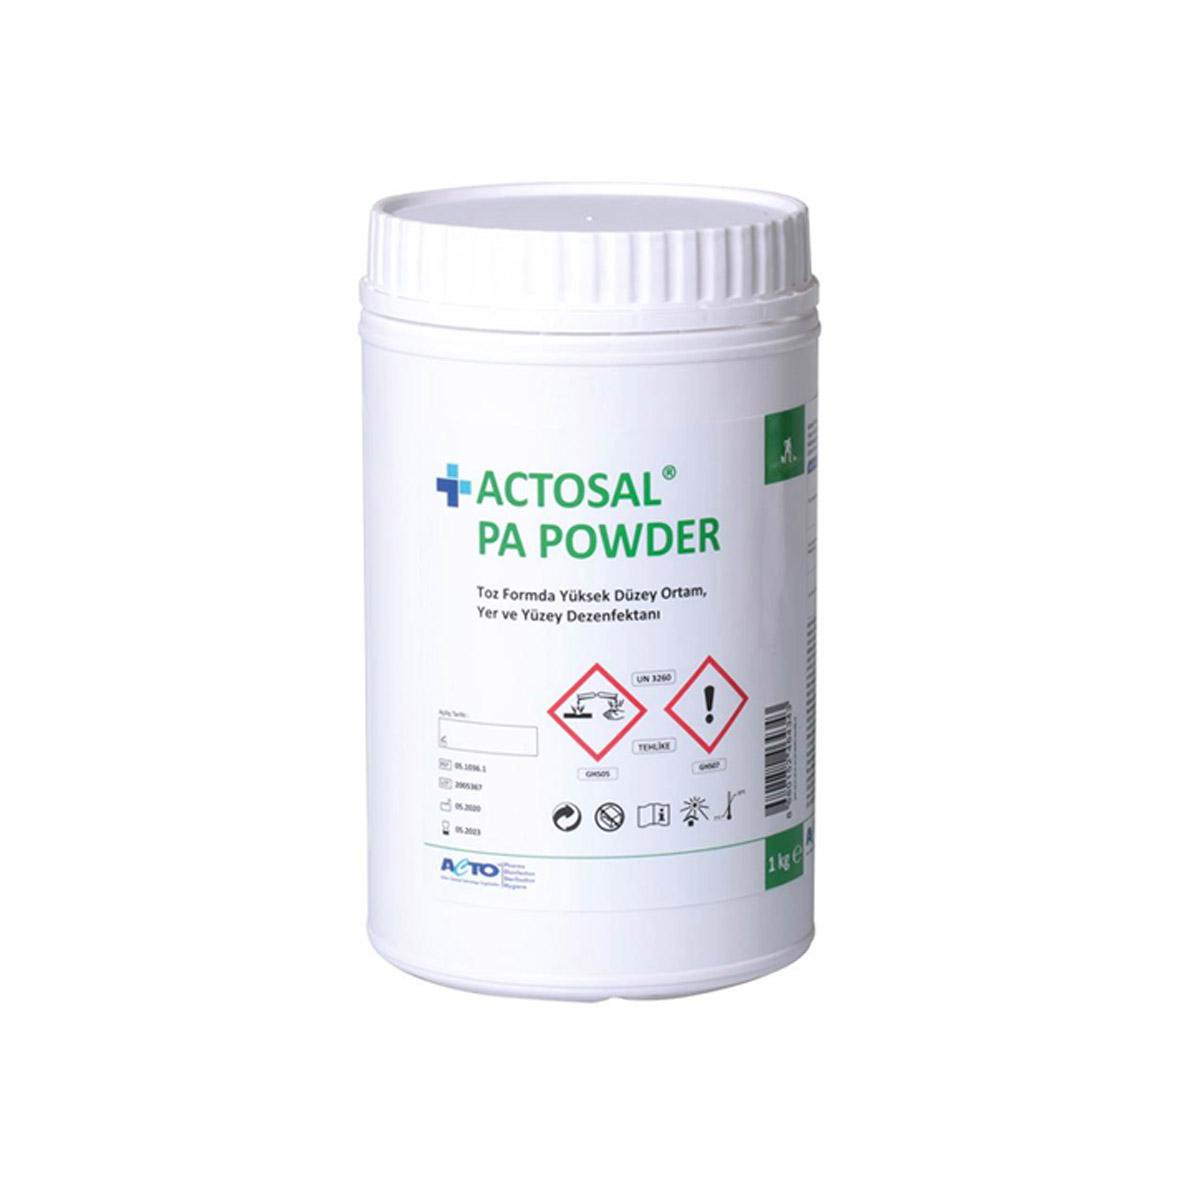 Actosal PA Powder 1 kg